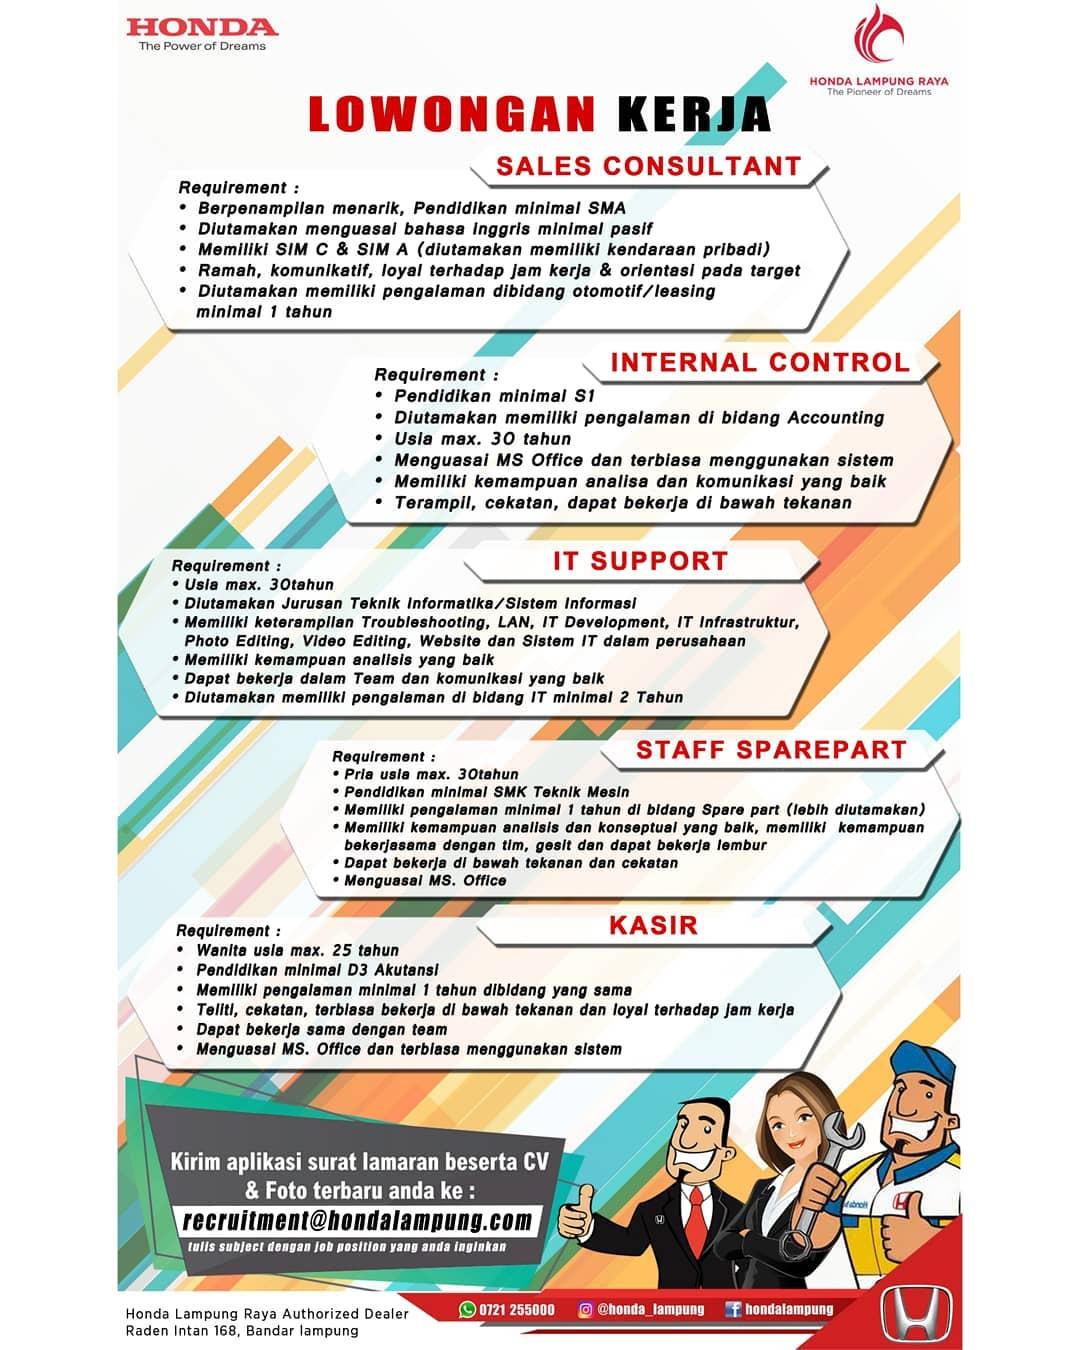 Lowongan Kerja Open Recruitment Honda Lampung Raya Desember 2018 Lampung Mei 2021 Karer Id